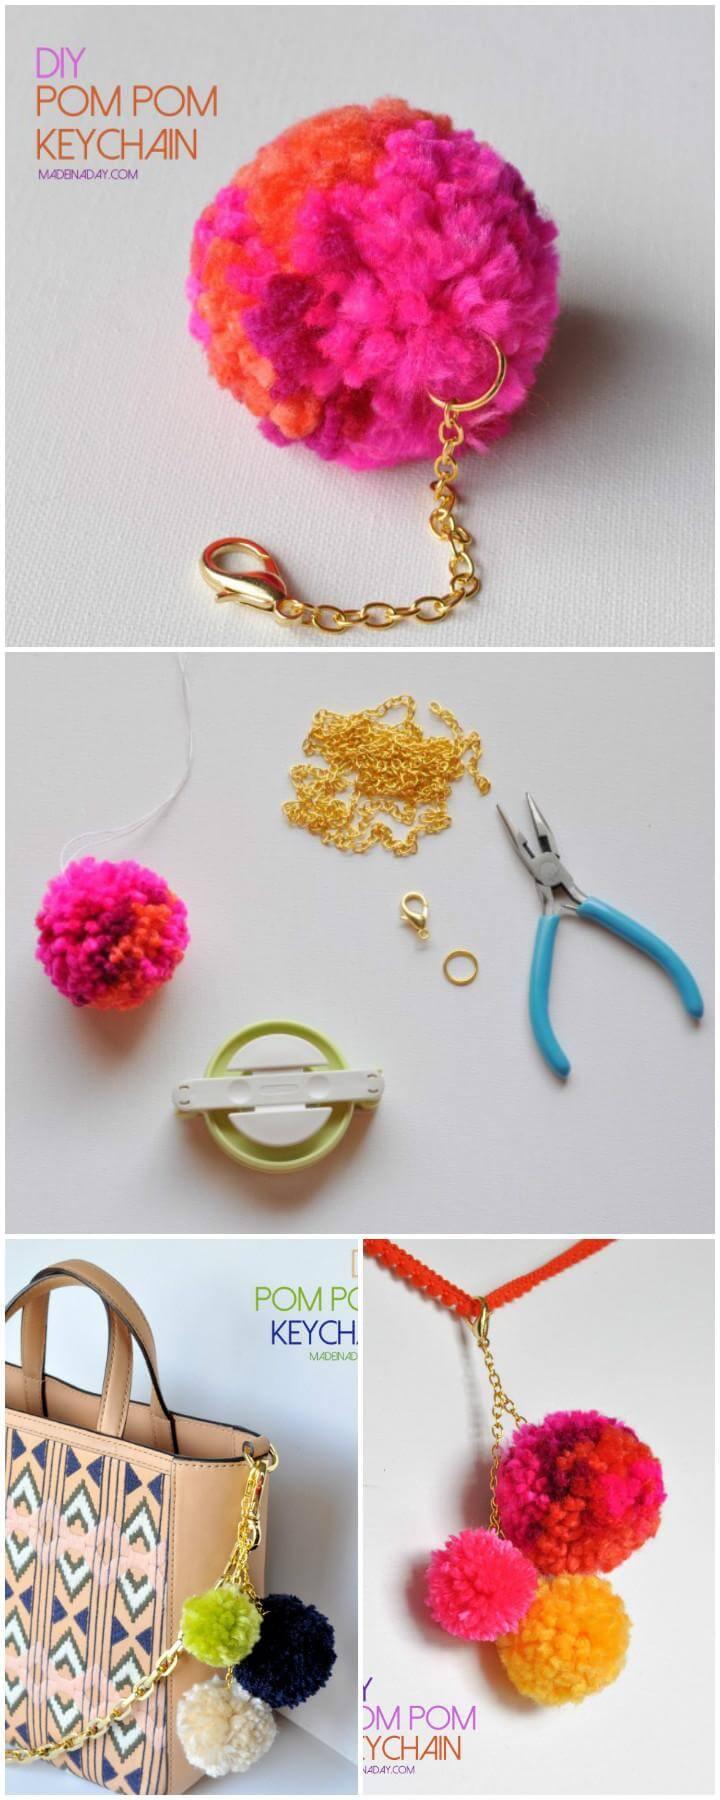 DIY Easy Handmade Pom-Pom Keychain